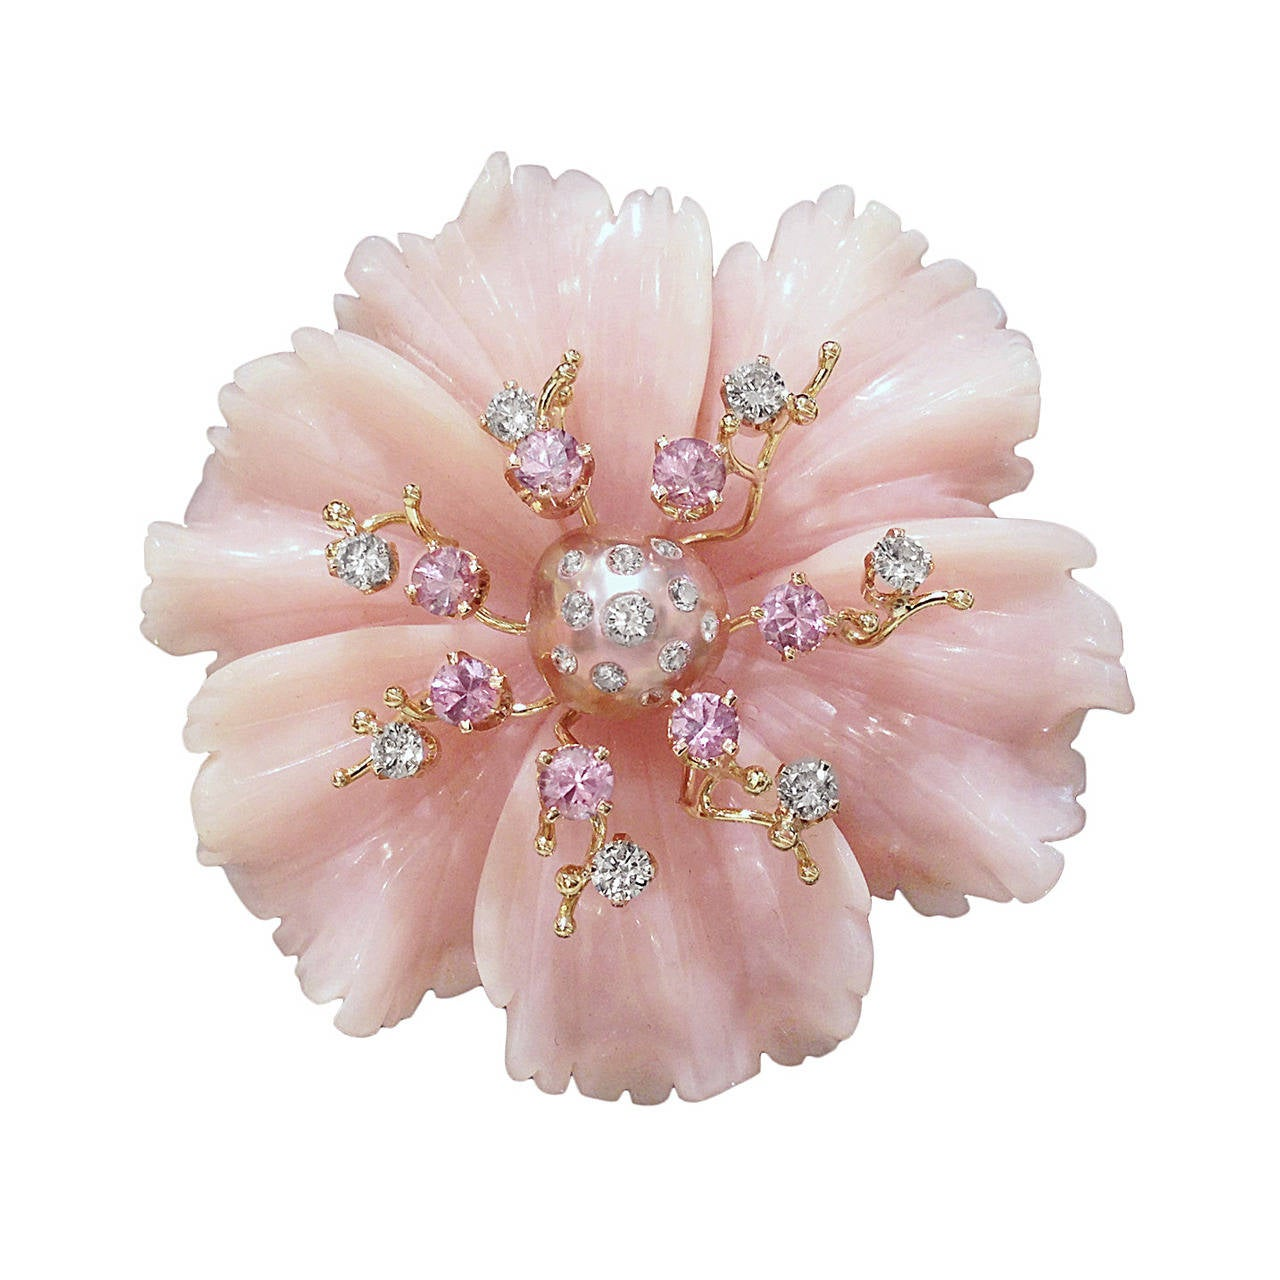 Russell Trusso Peruvian Pink Opal Pink Sapphire Diamond